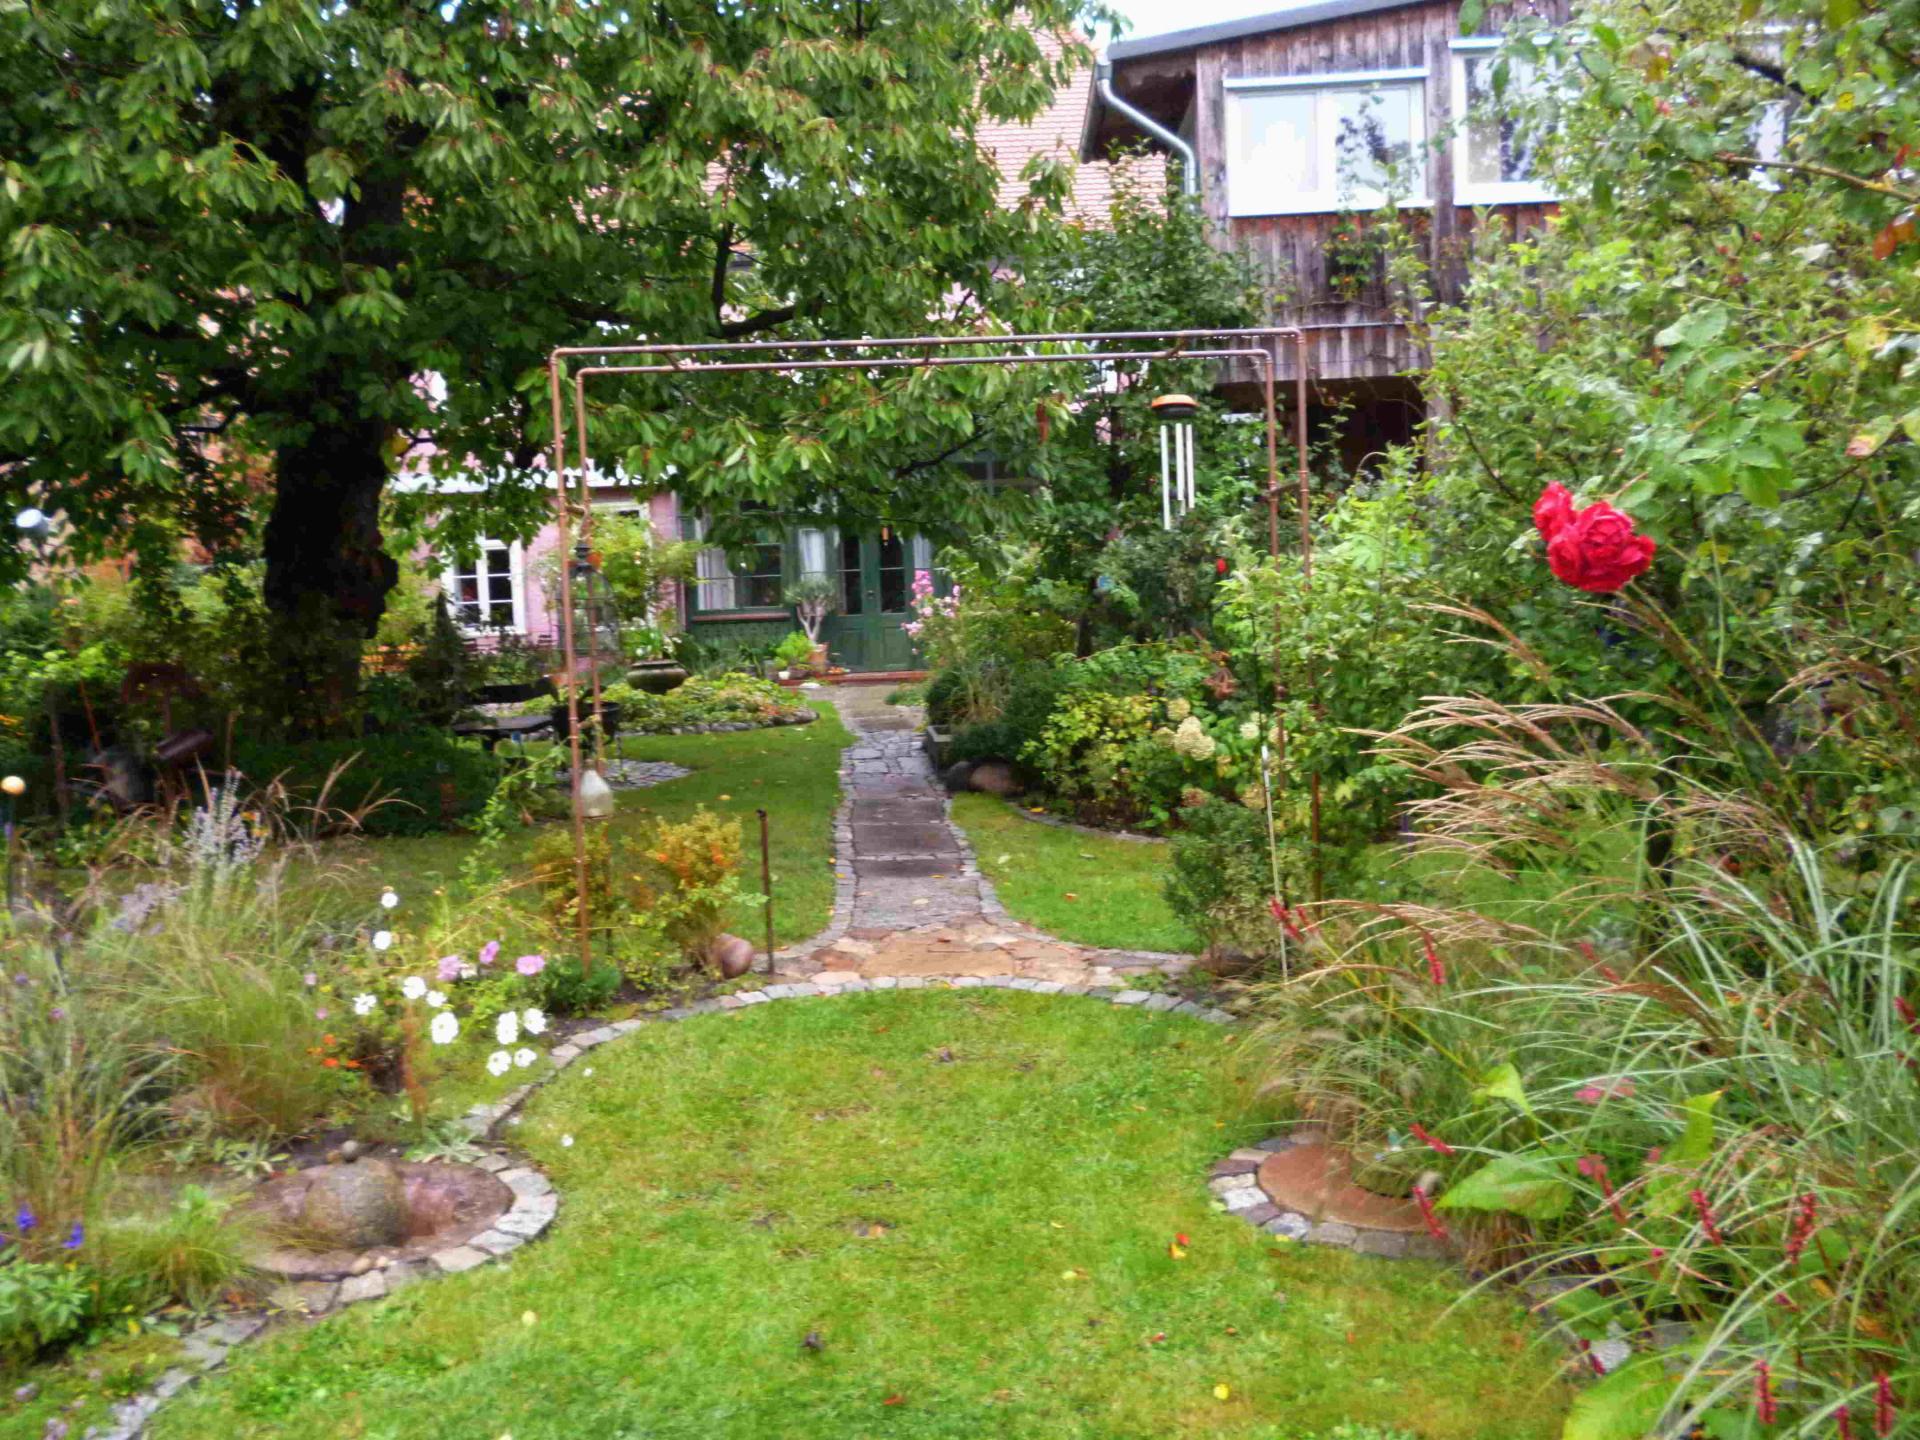 Offene Gartenpfporte 26-09-2020 Bild 04